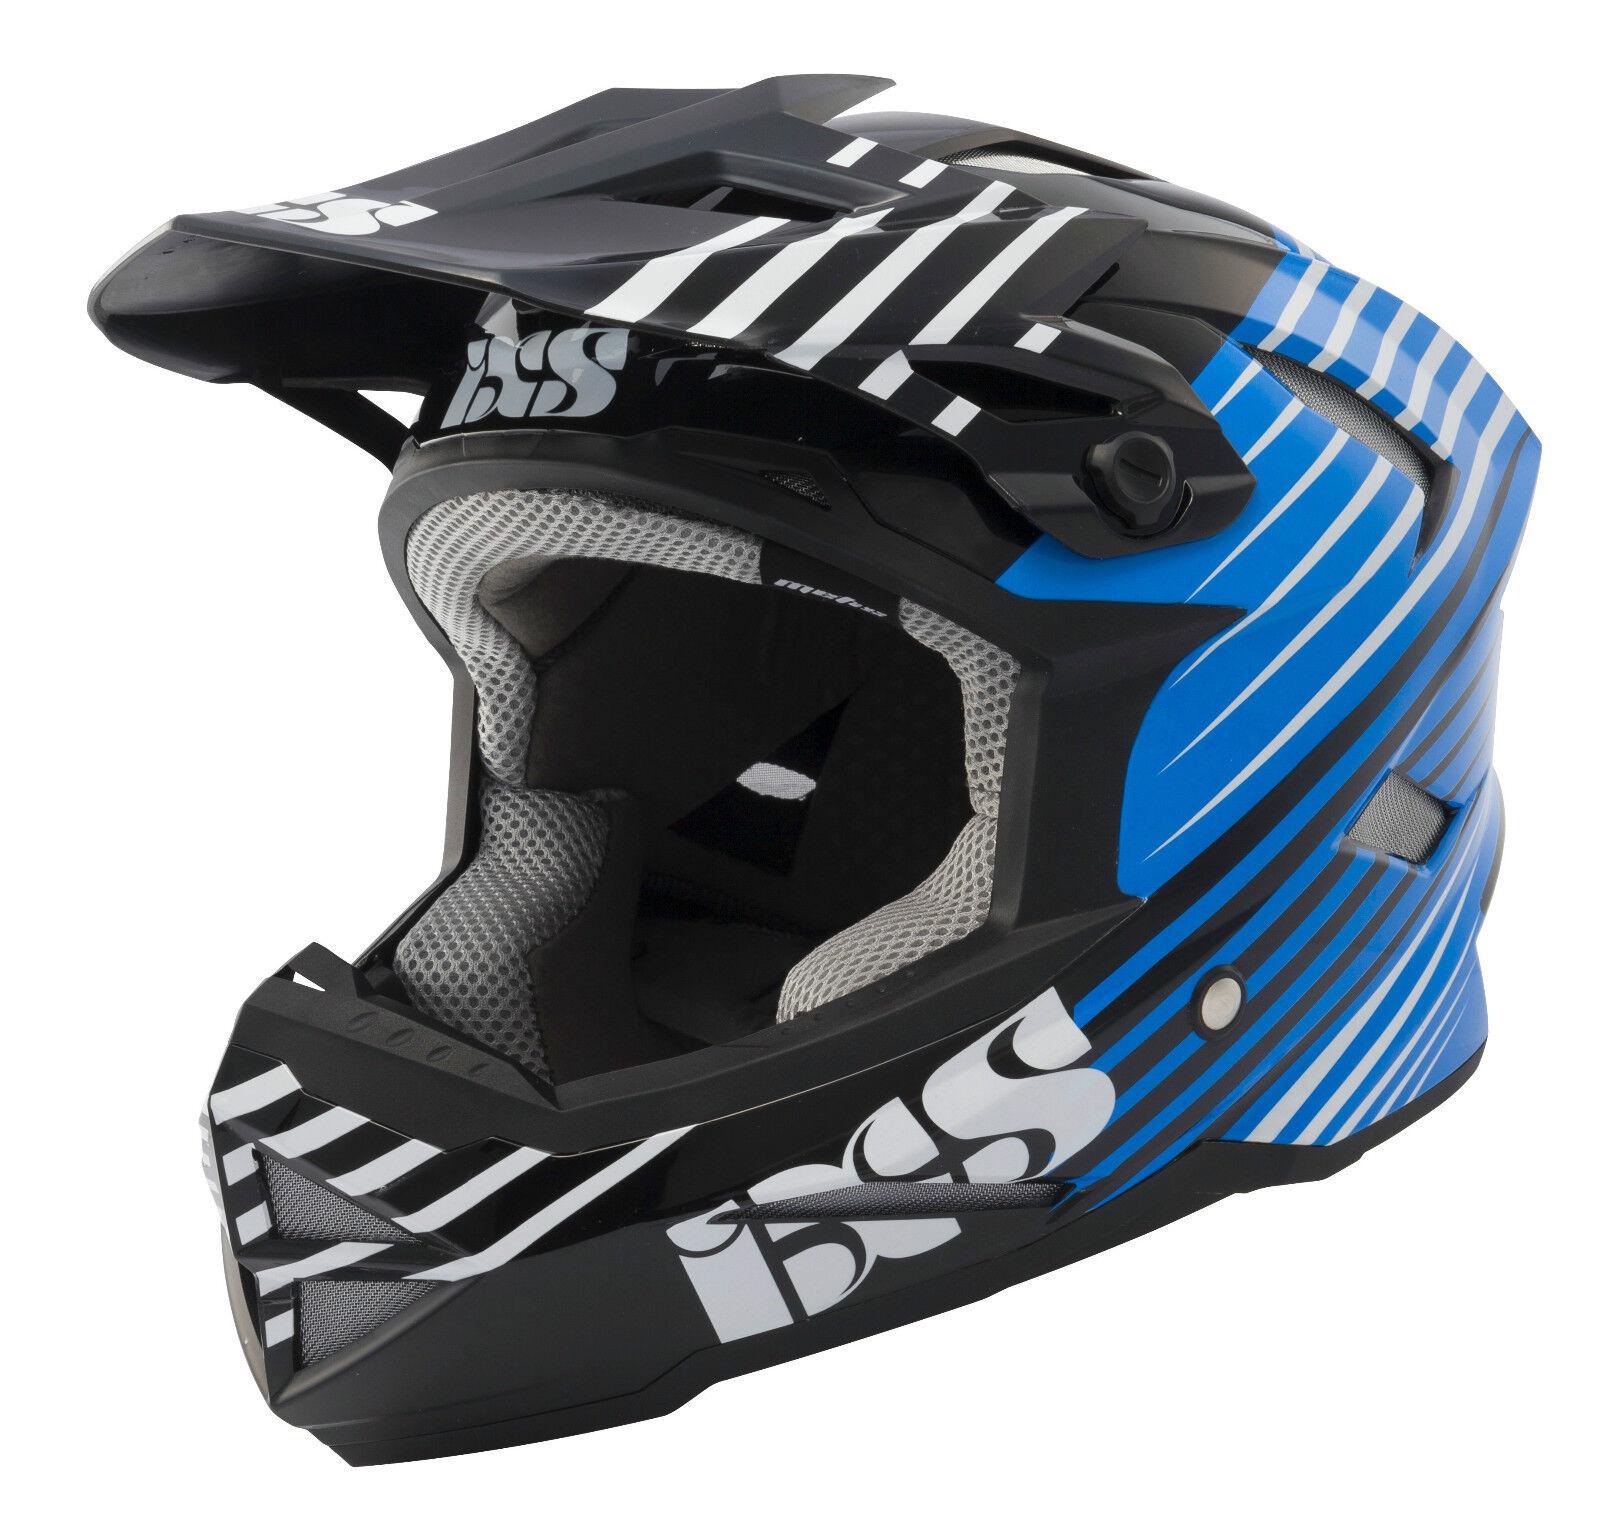 PVP  IXS Metis Slide Casco Ciclismo Downhill DH MTB Helmet XL 61-62 cm